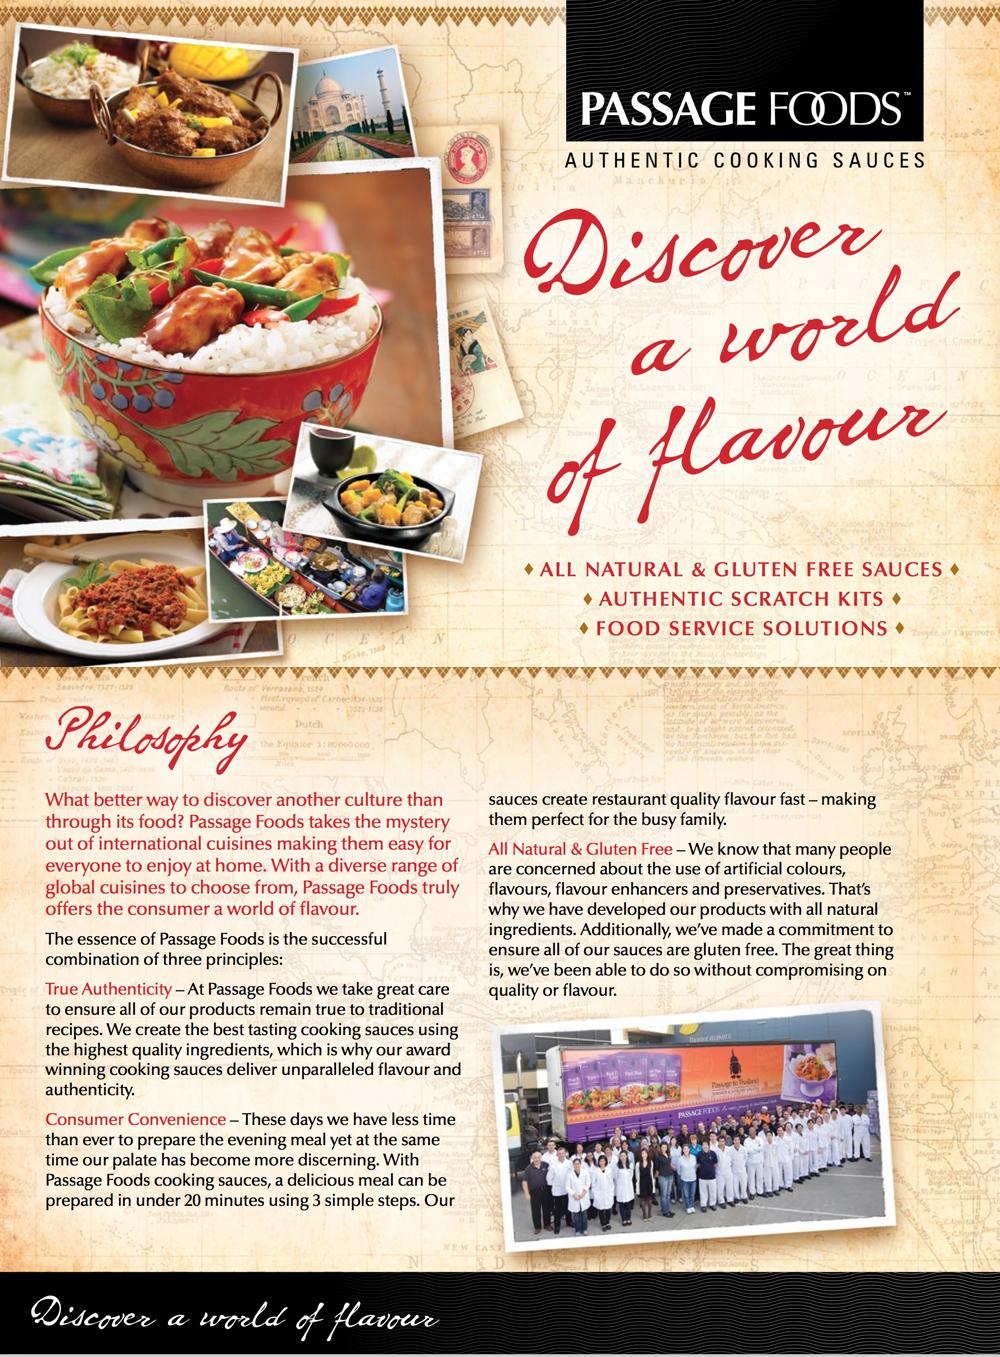 Wholesale Egetarian Food Coloring Powder/hilippines Spicy Food - Buy ...